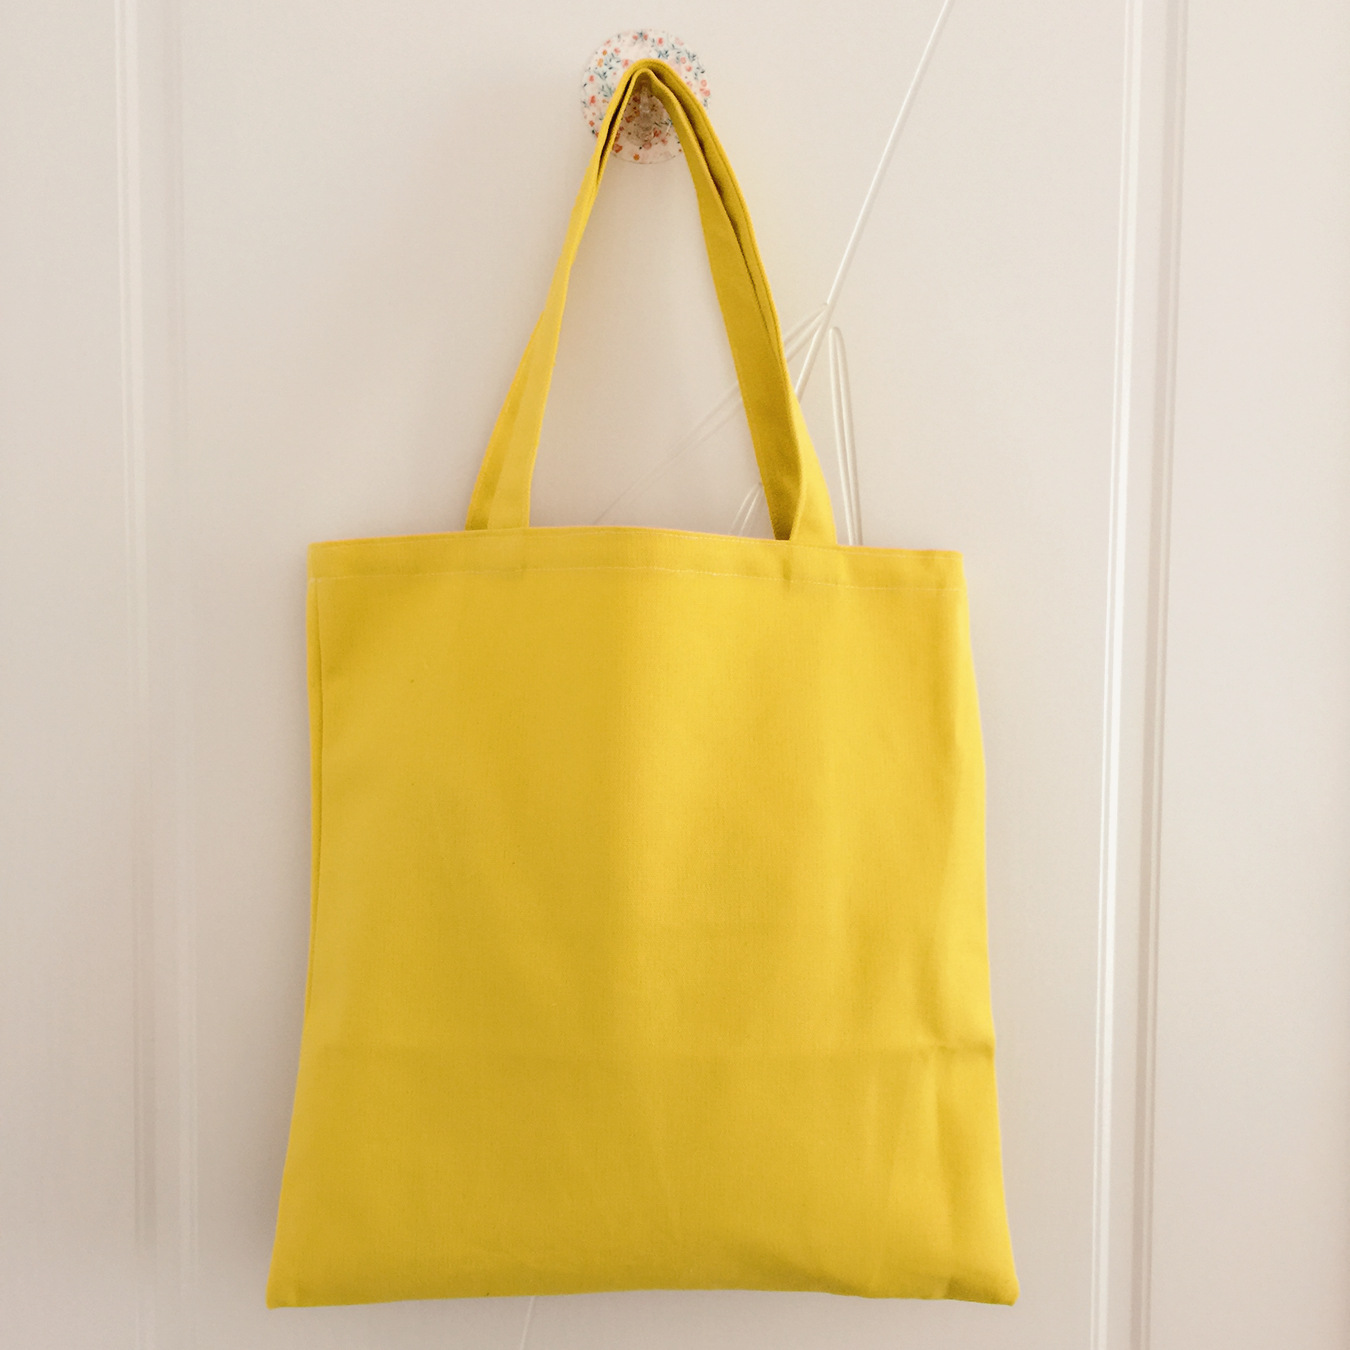 Foldable Handbag tote women college book bags crossbody shoulder bag free shipping